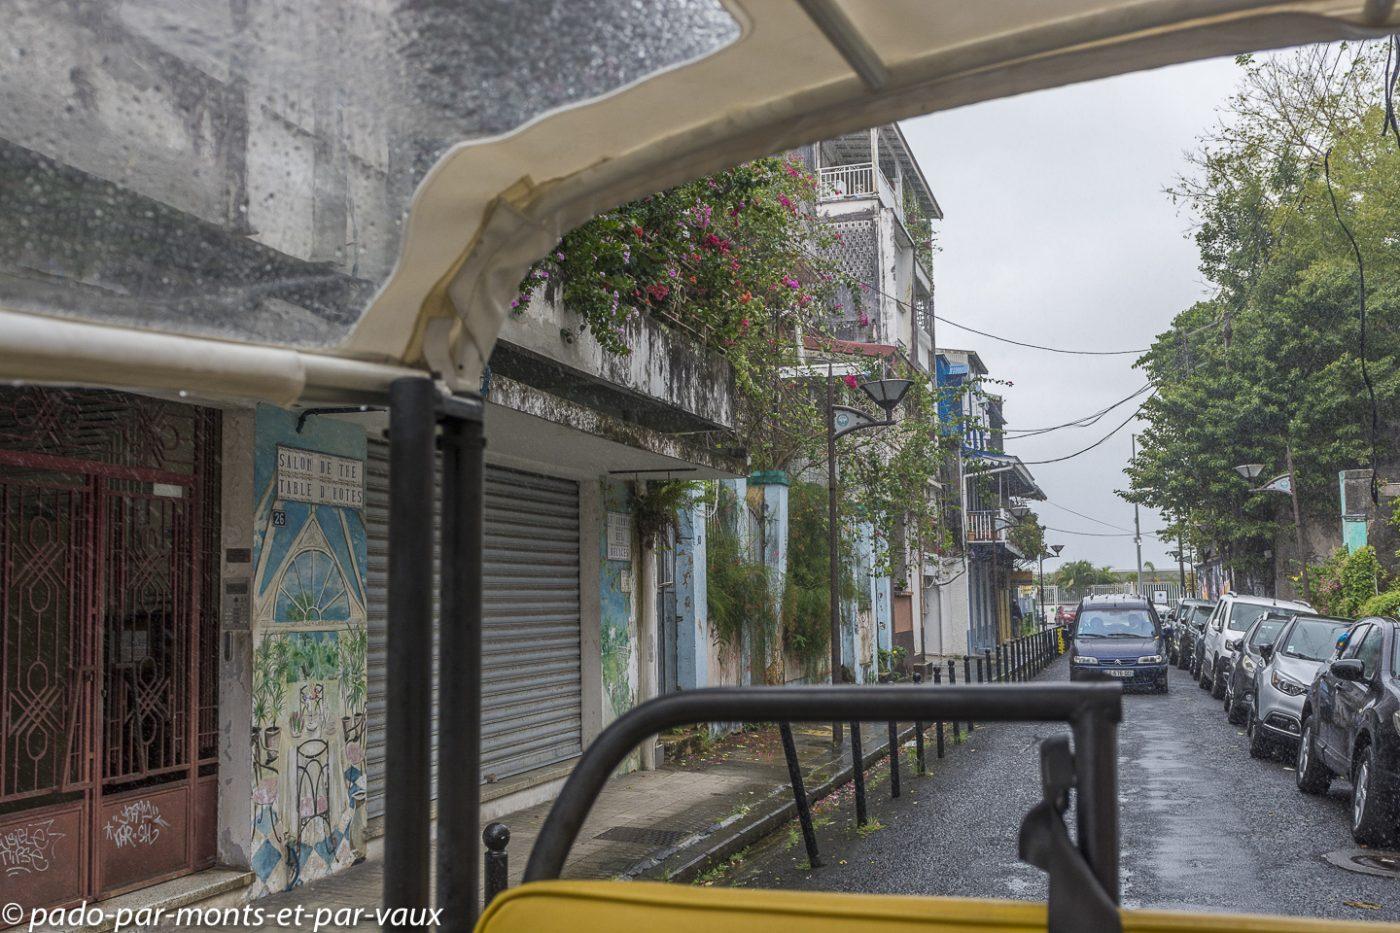 2021- Guadeloupe- Pointe-a-Pitre